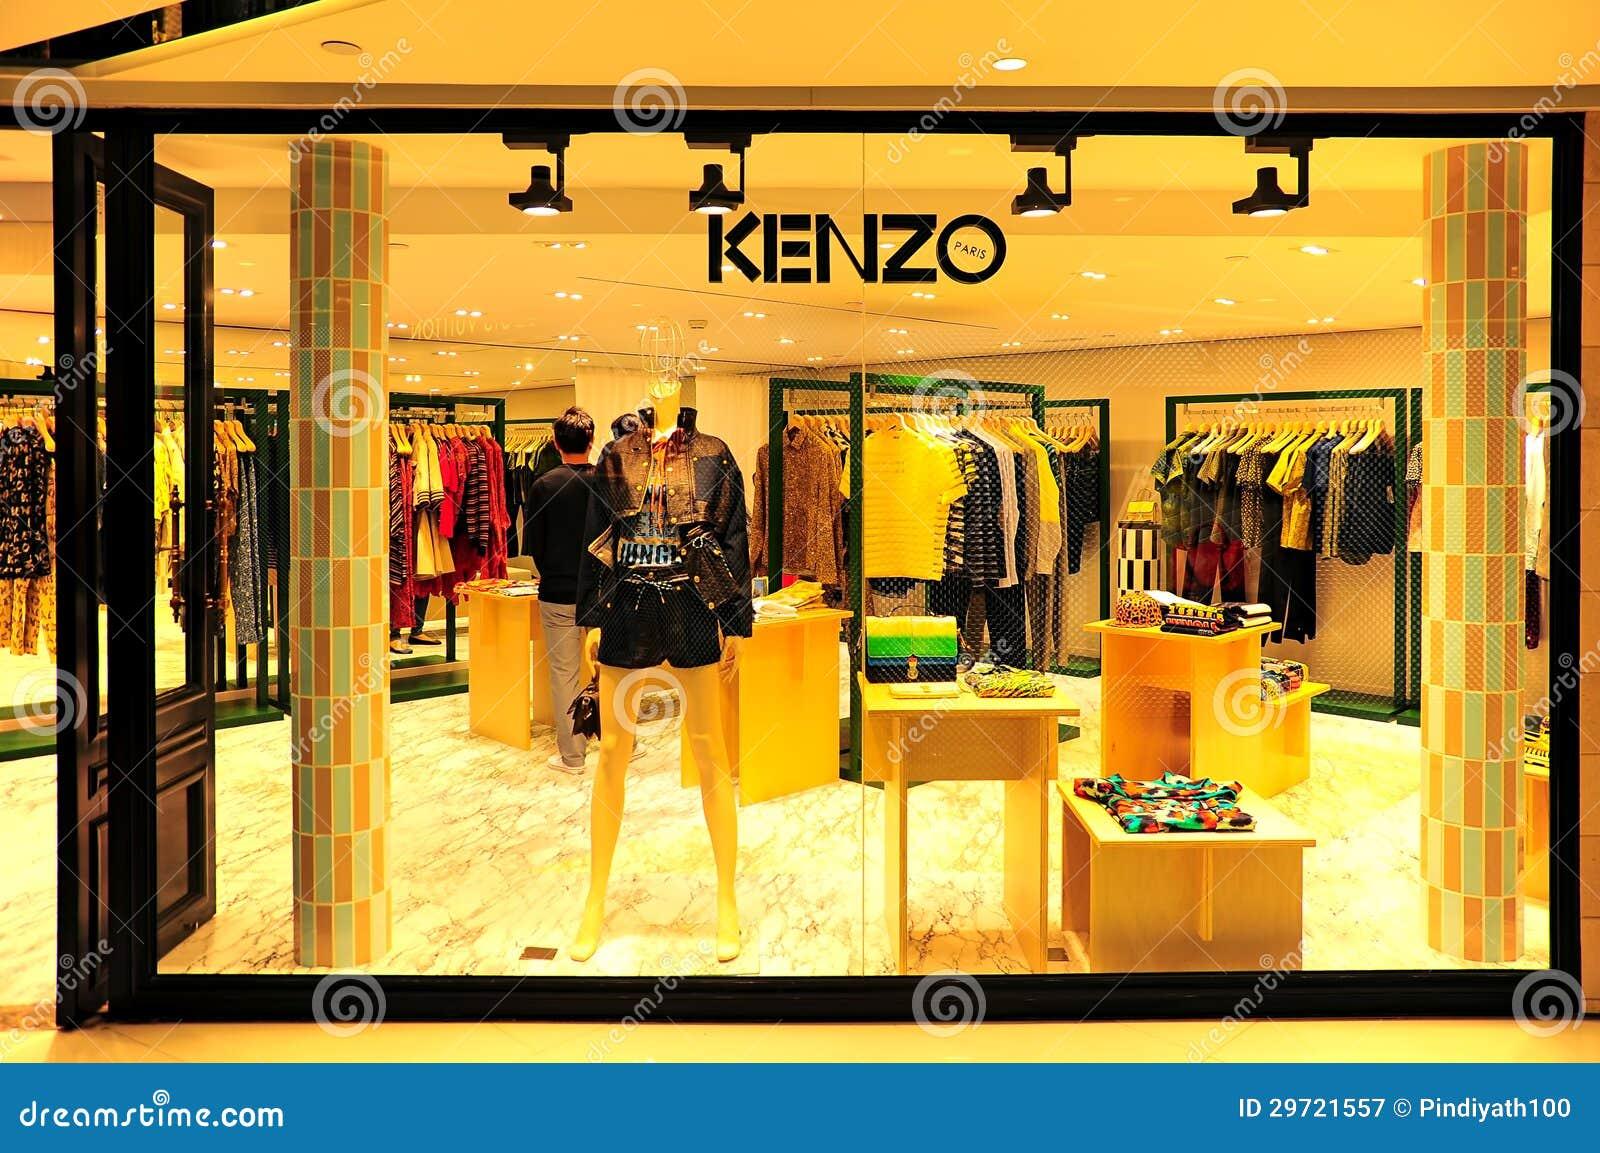 Bossini apparel outlet at the peak galleria, hong kong